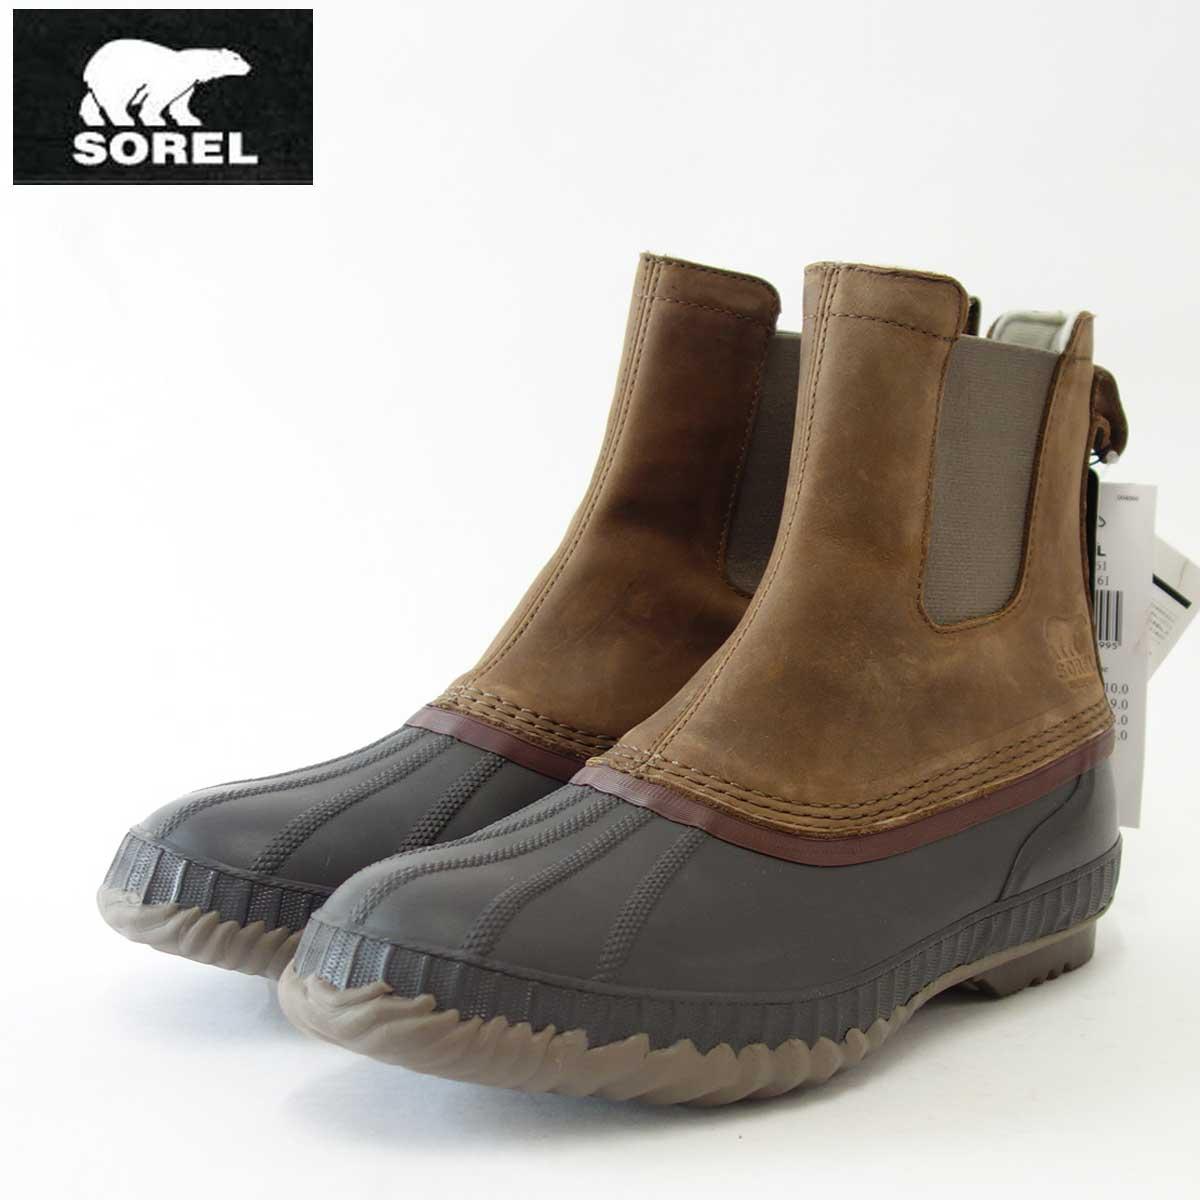 SOREL ソレル NM2609(メンズ)シャイアン 2 チェルシー:Umber/Buffalo(261)保温性・防水性抜群の快適ウィンターブーツ「靴」